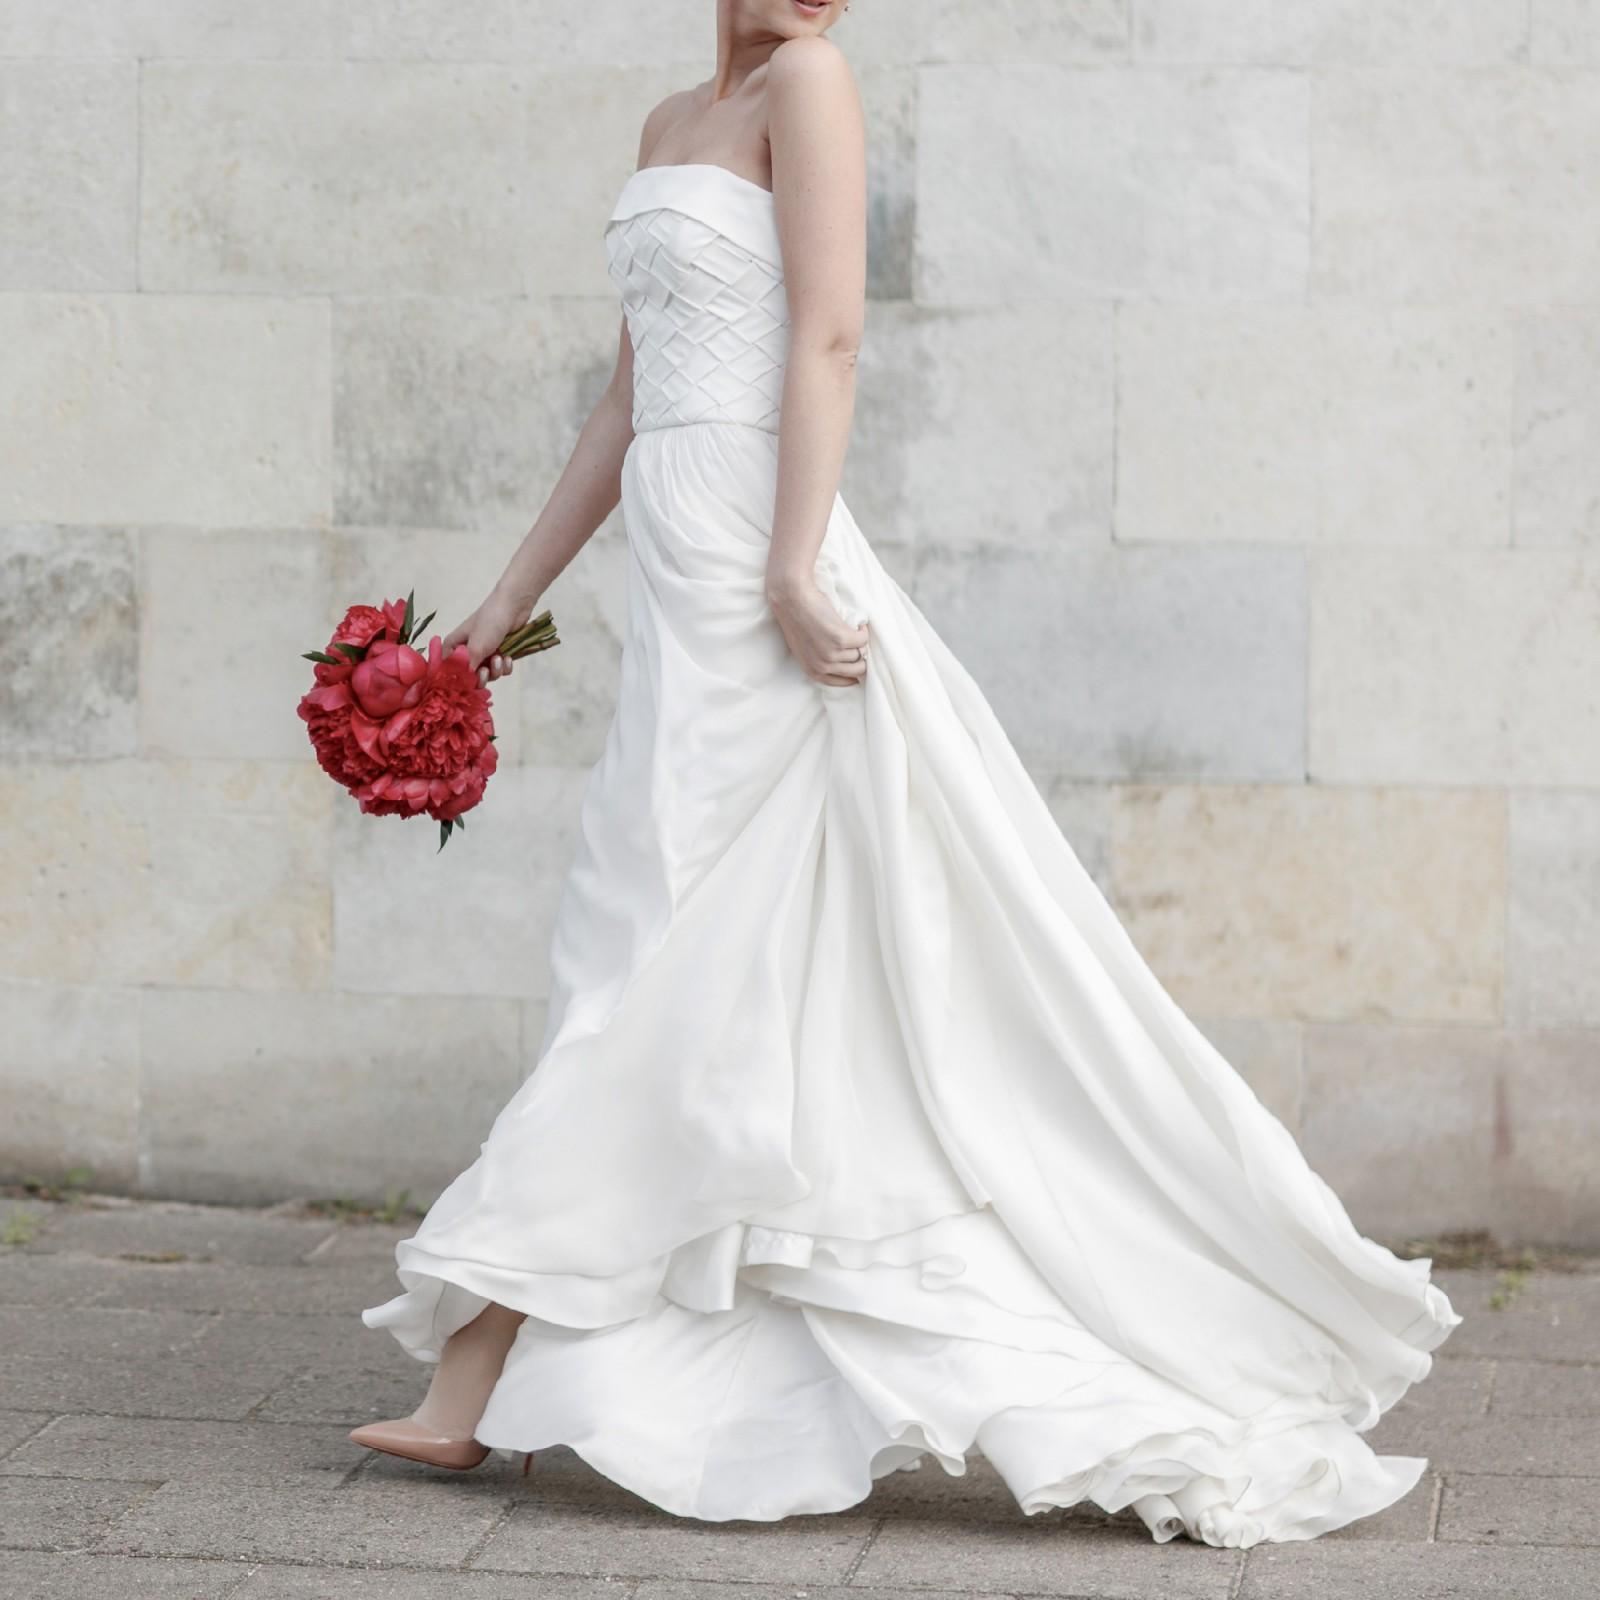 Egidijus Rainys Custom Made Silk Dress Used Wedding Dress